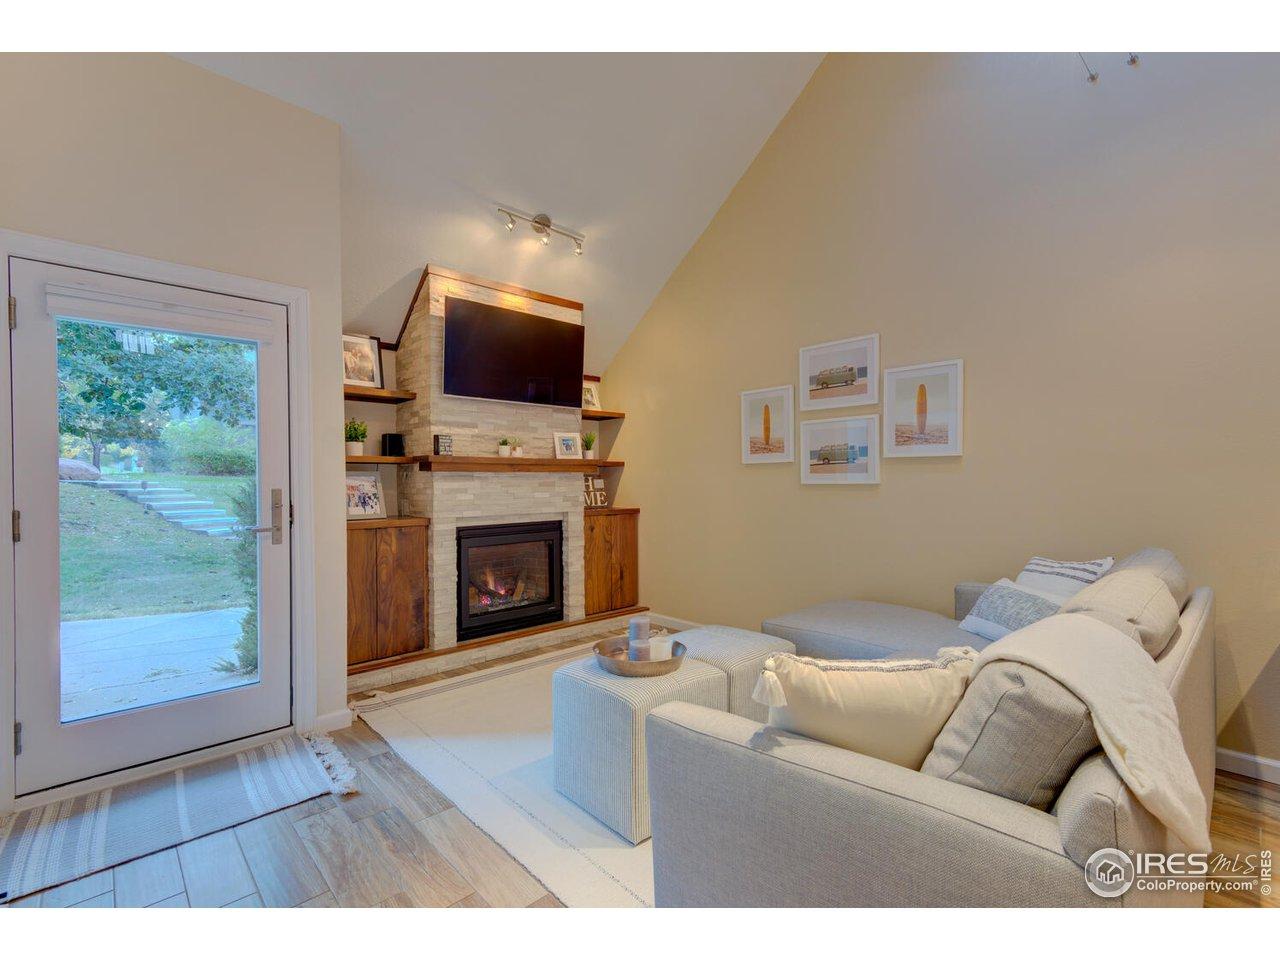 Nana Wall for Indoor/Outdoor Living